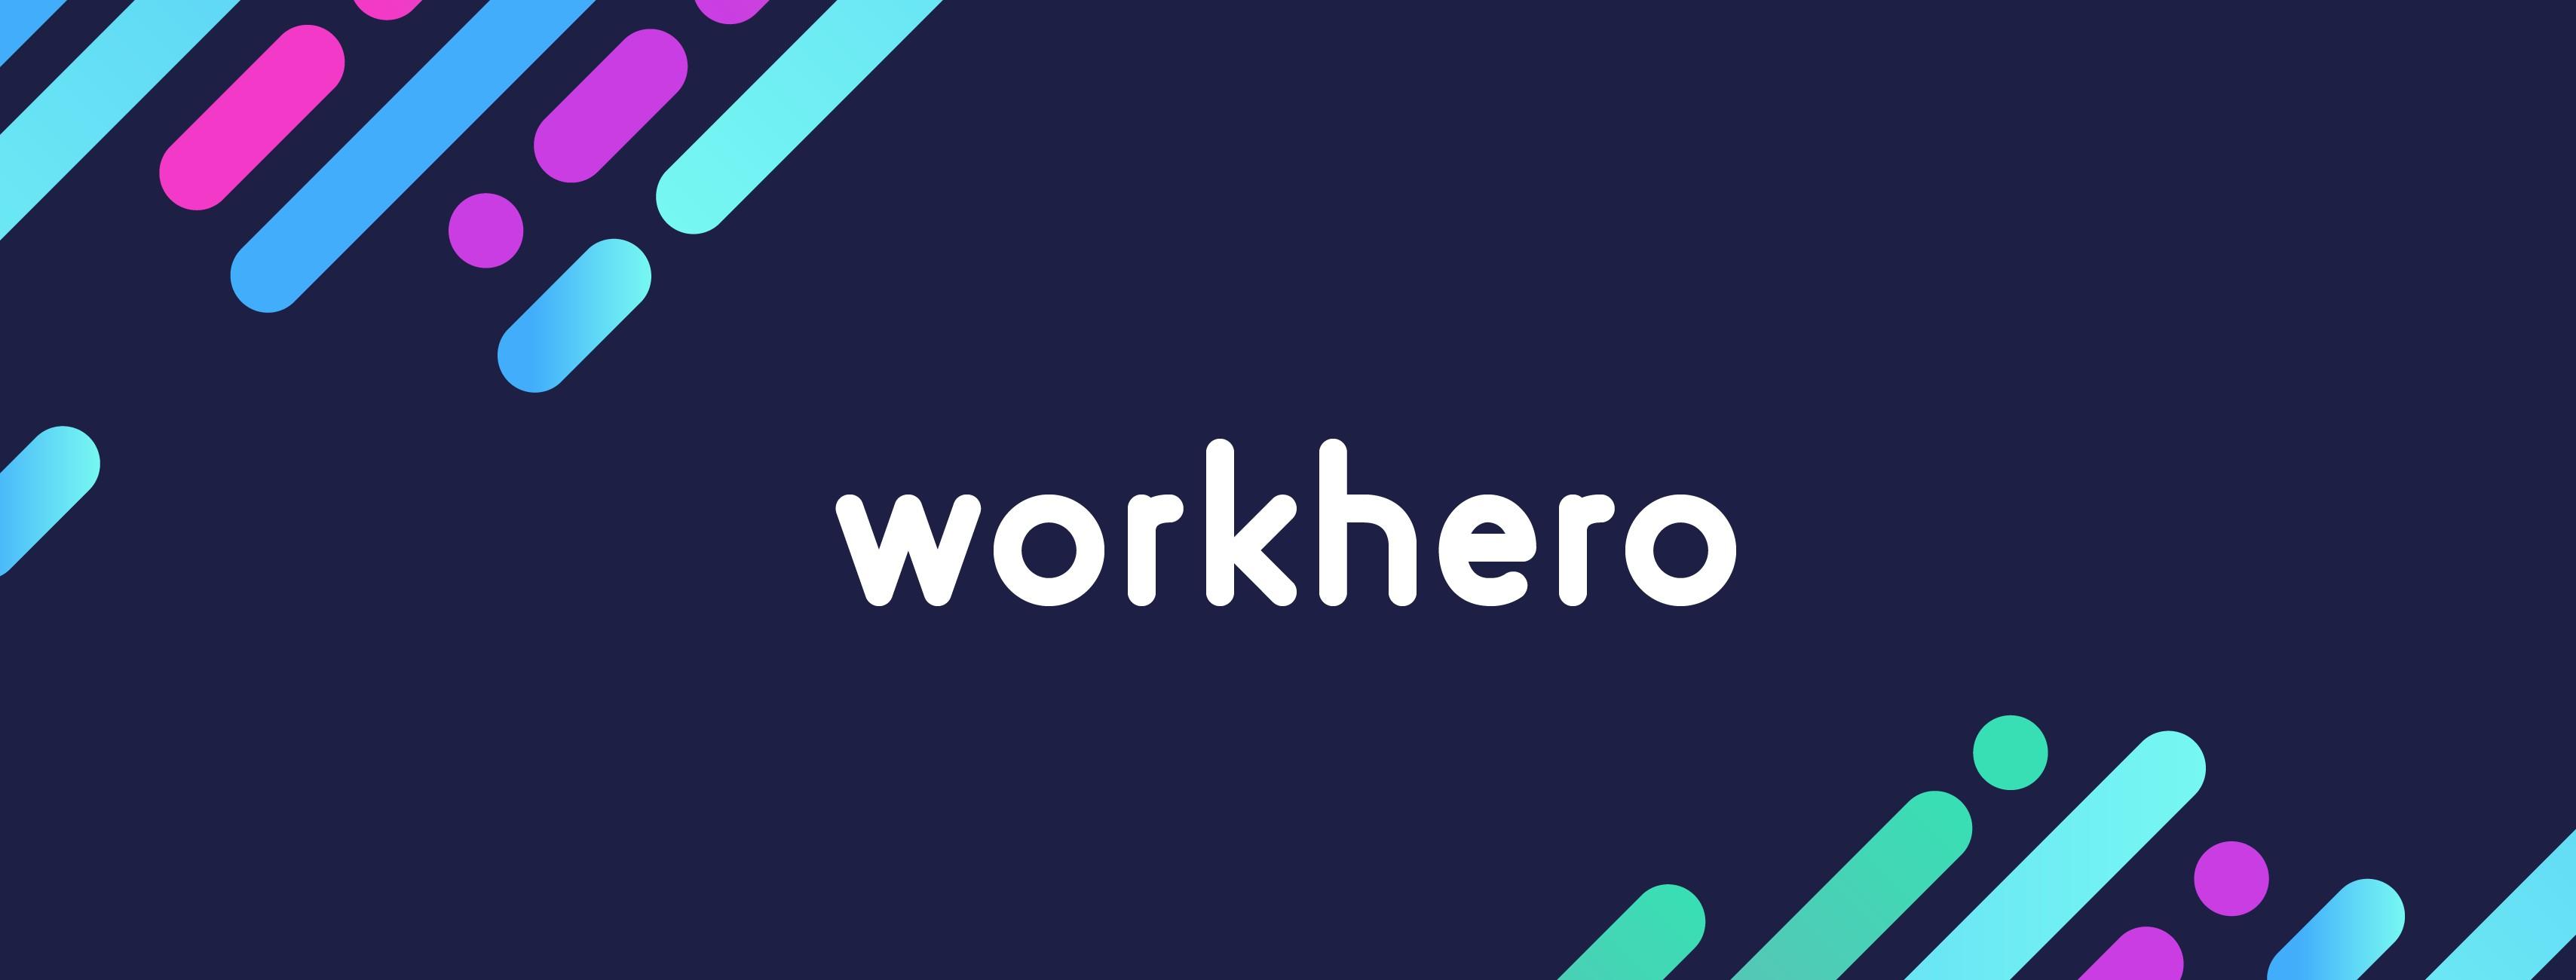 Work Hero Linkedin